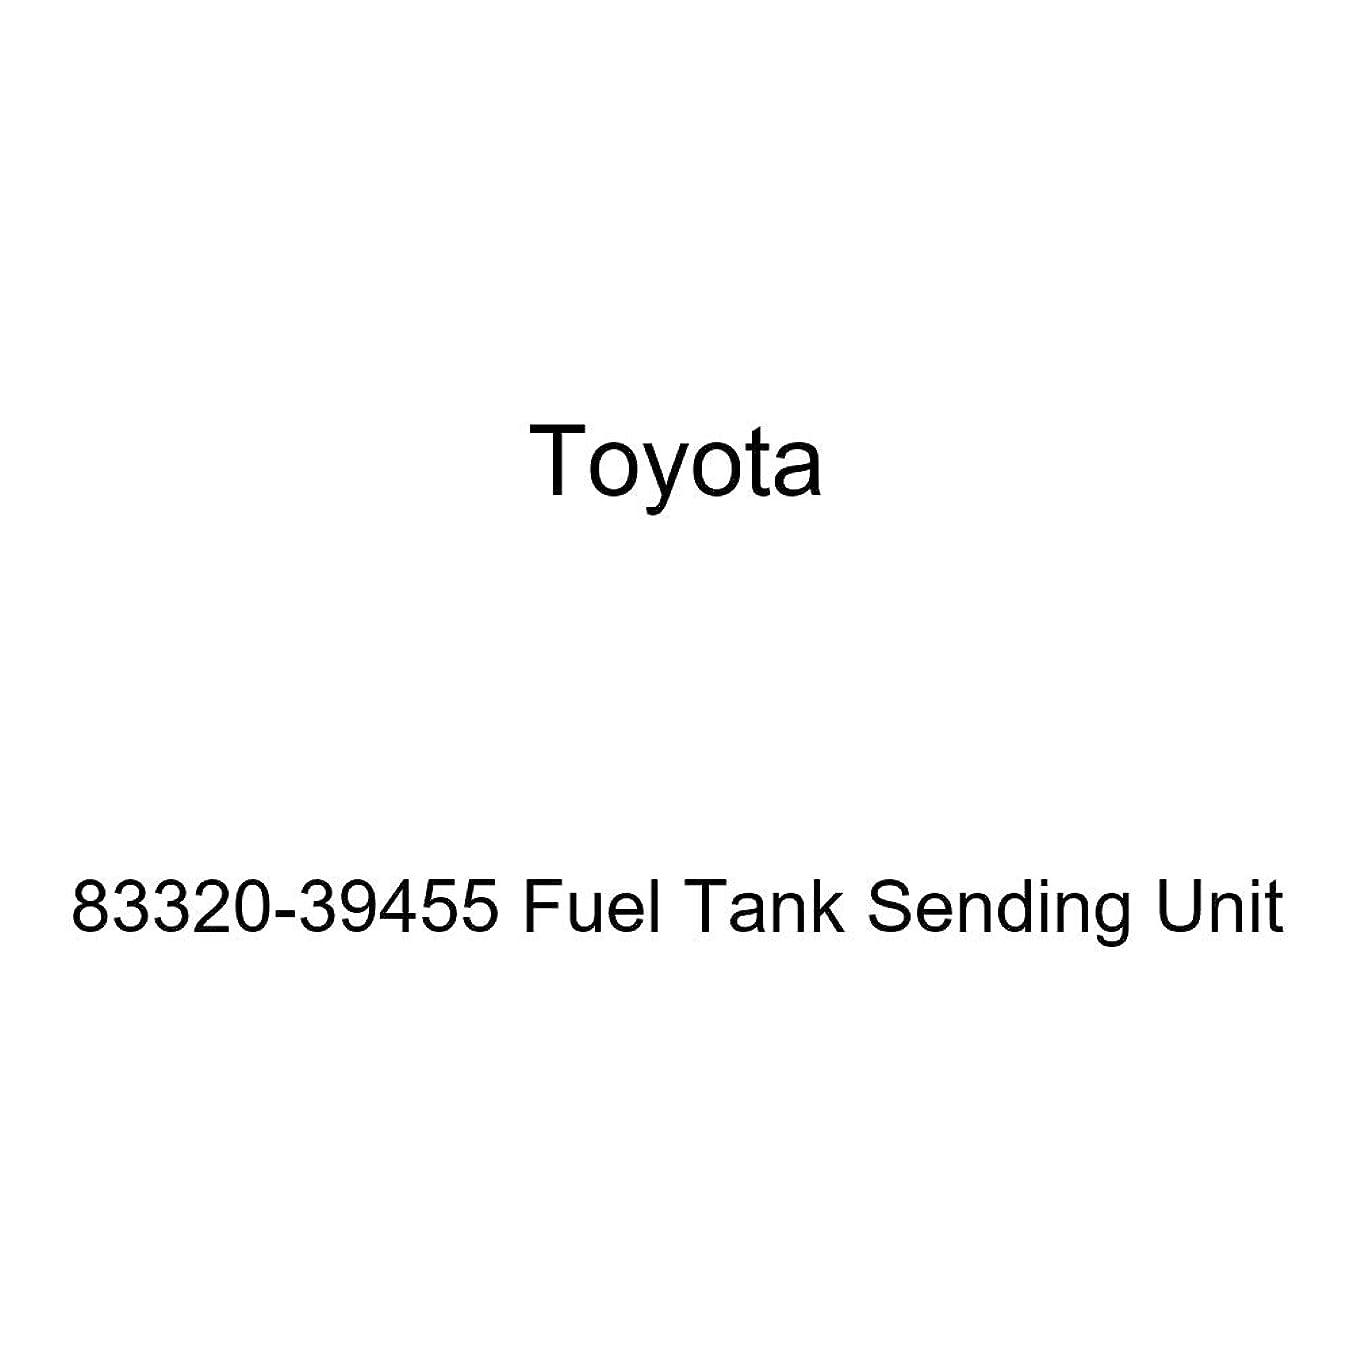 Toyota 83320-39455 Fuel Tank Sending Unit